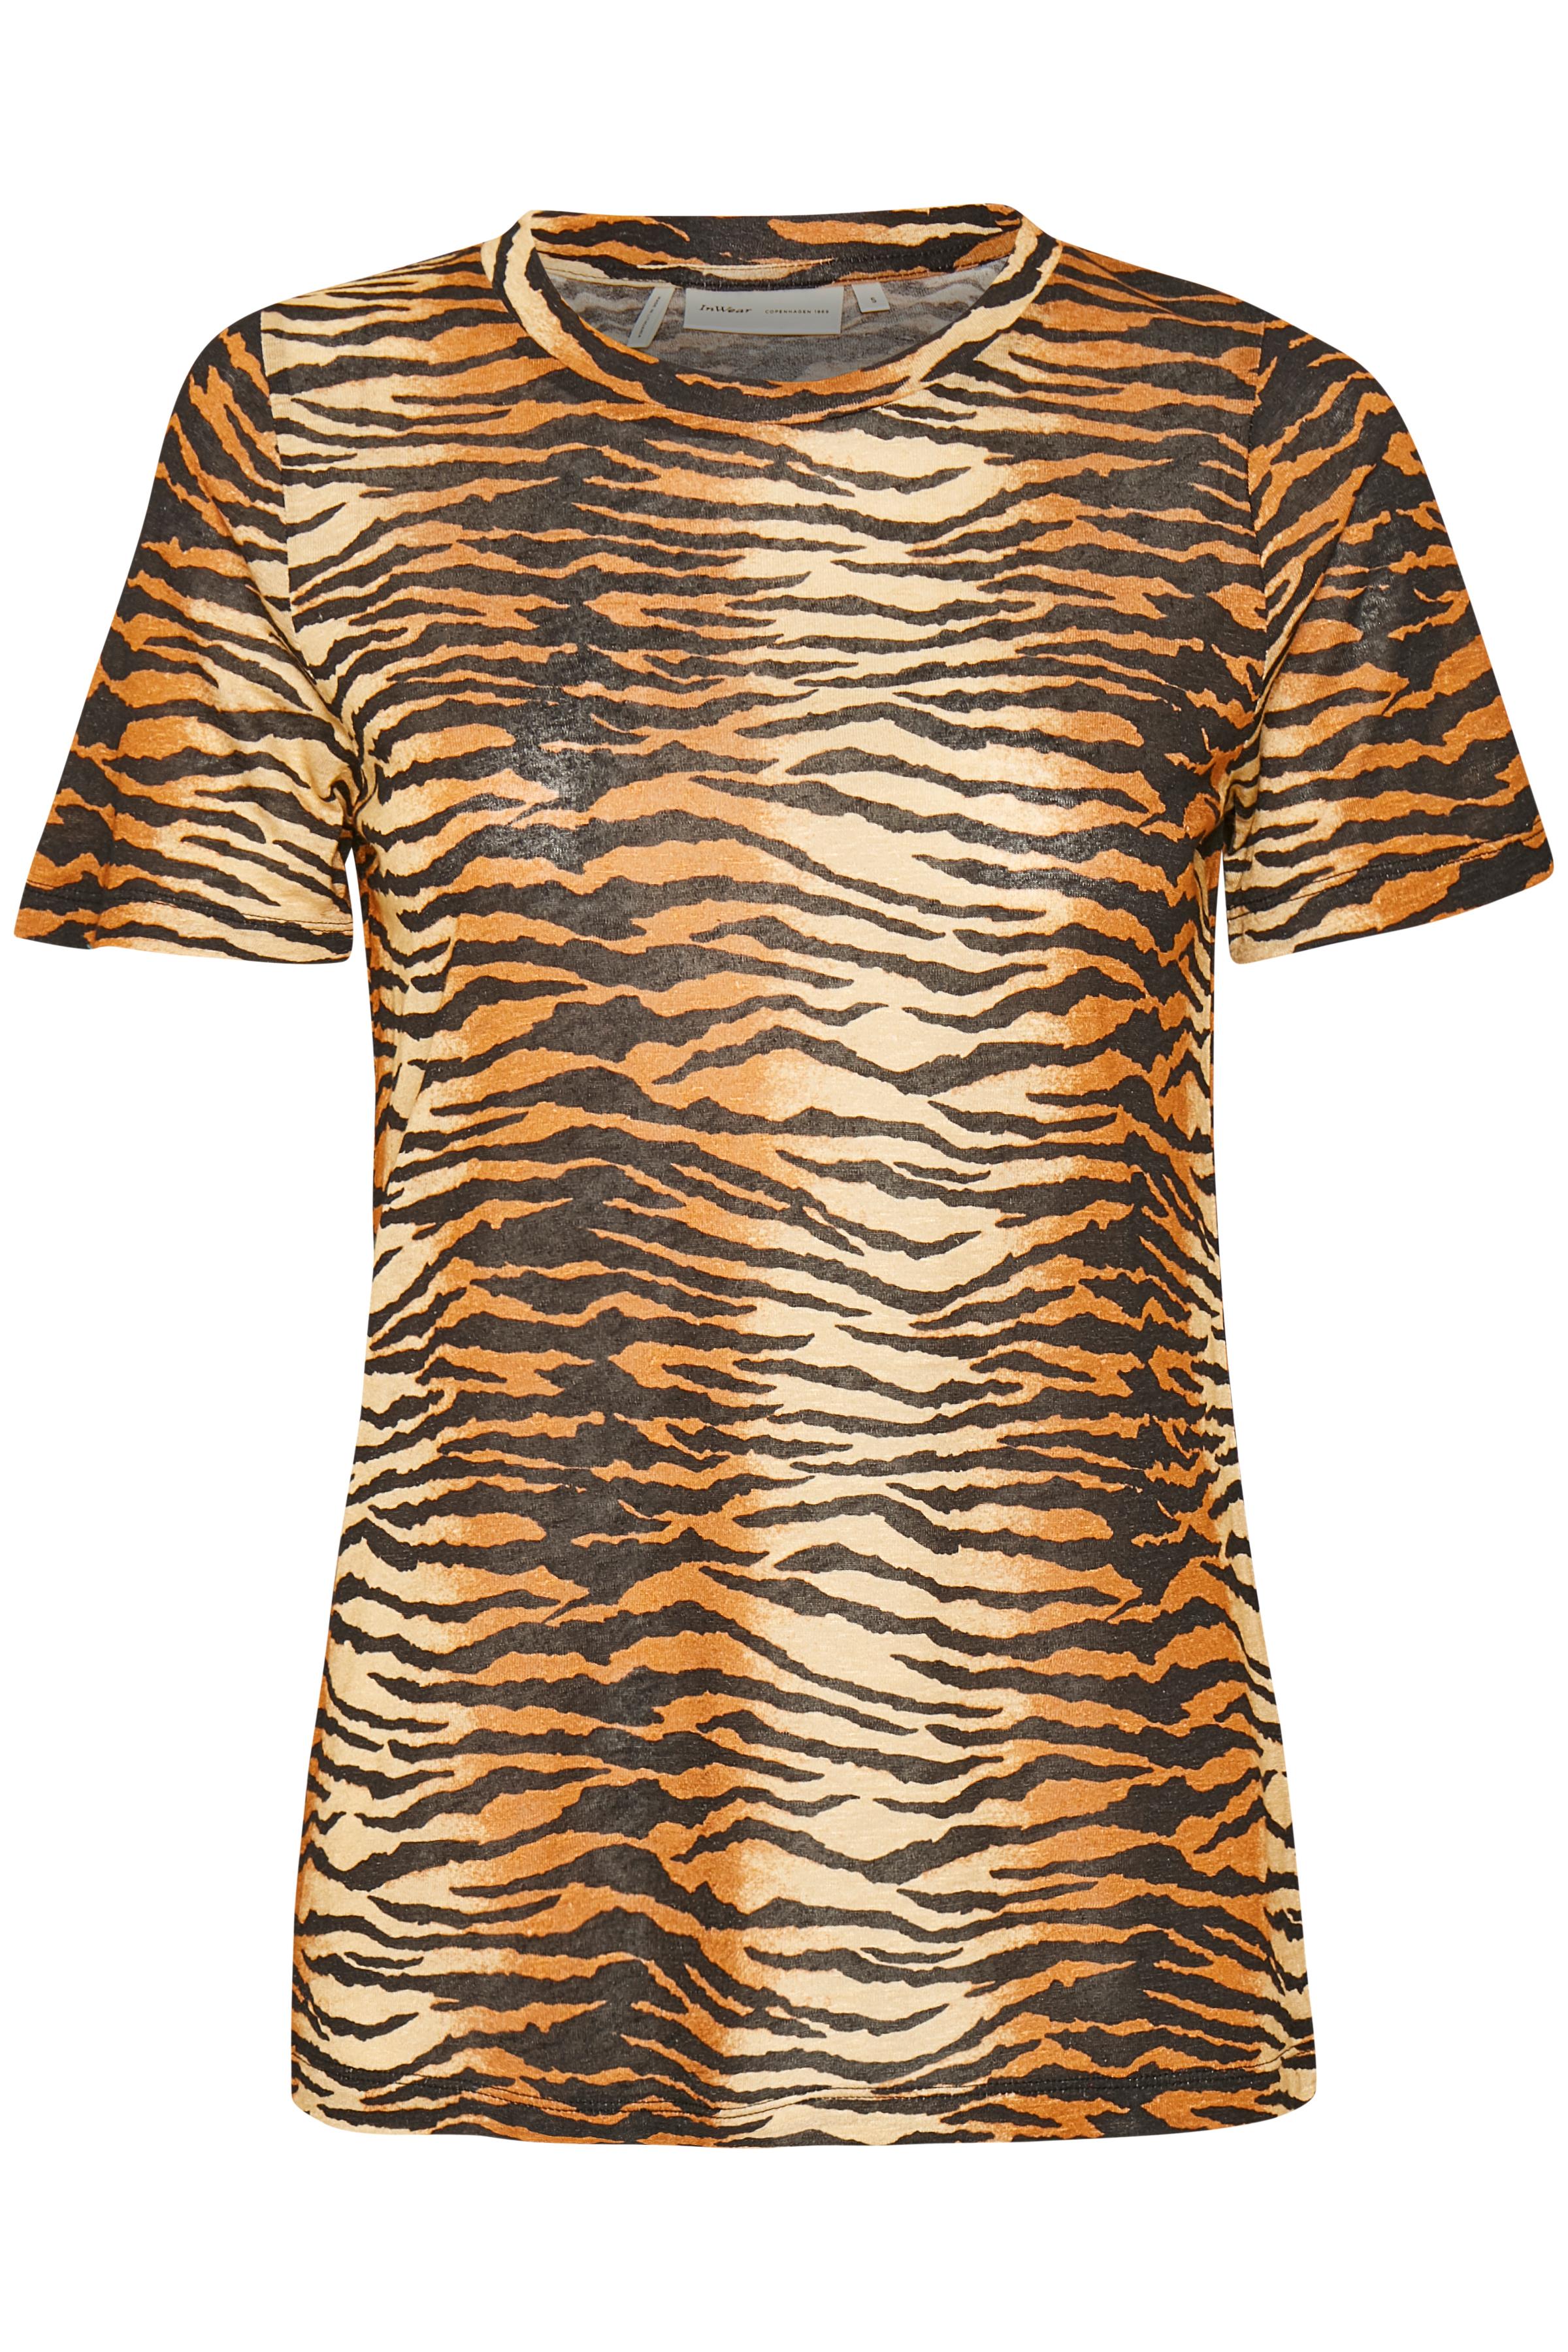 Brown Tiger Stripe T-Shirt – Køb Brown Tiger Stripe T-Shirt fra str. XS-XXL her